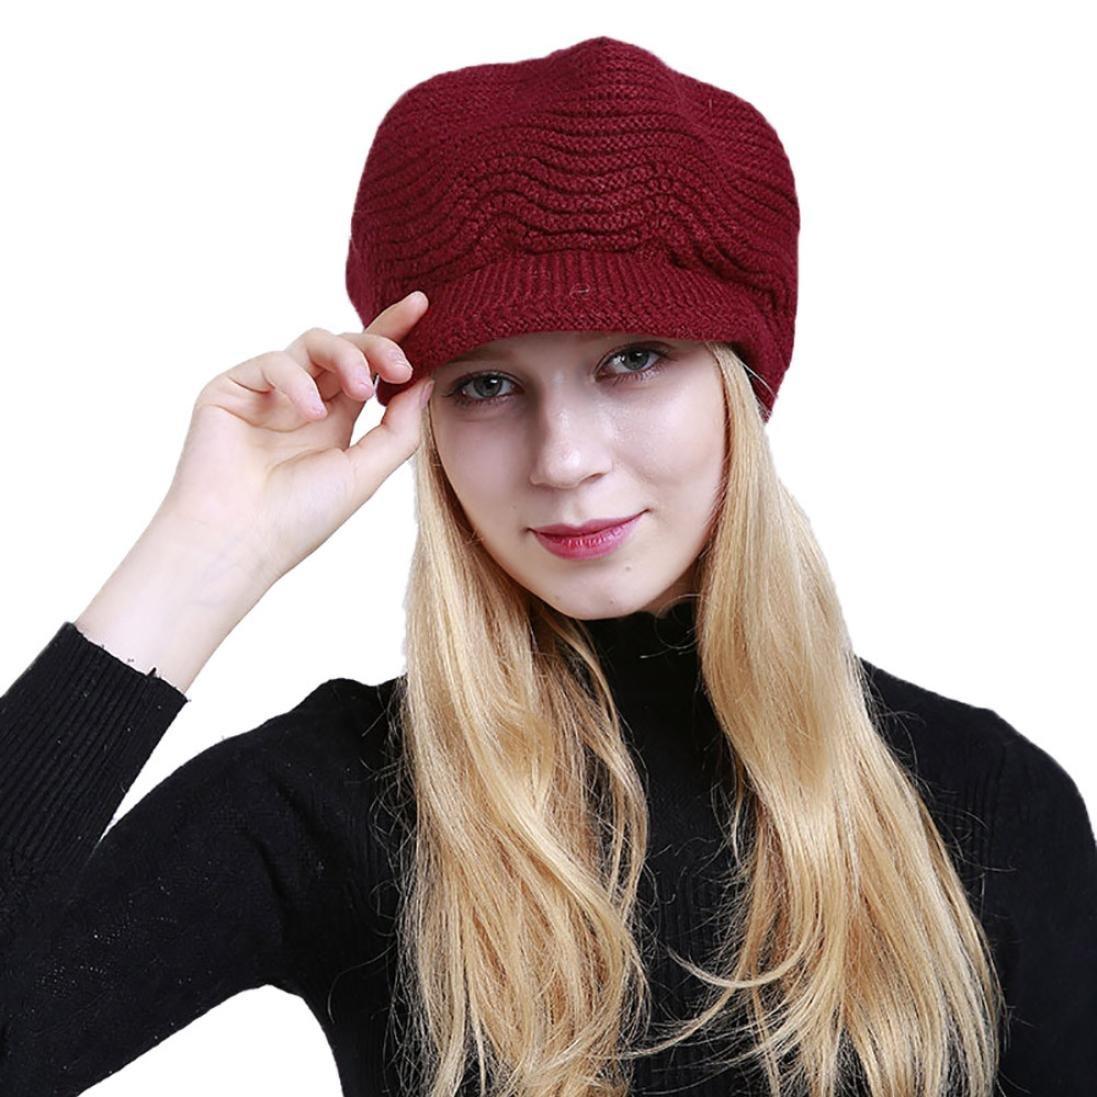 Fullfun Women Girls Warm Wool Knit Visors Hat